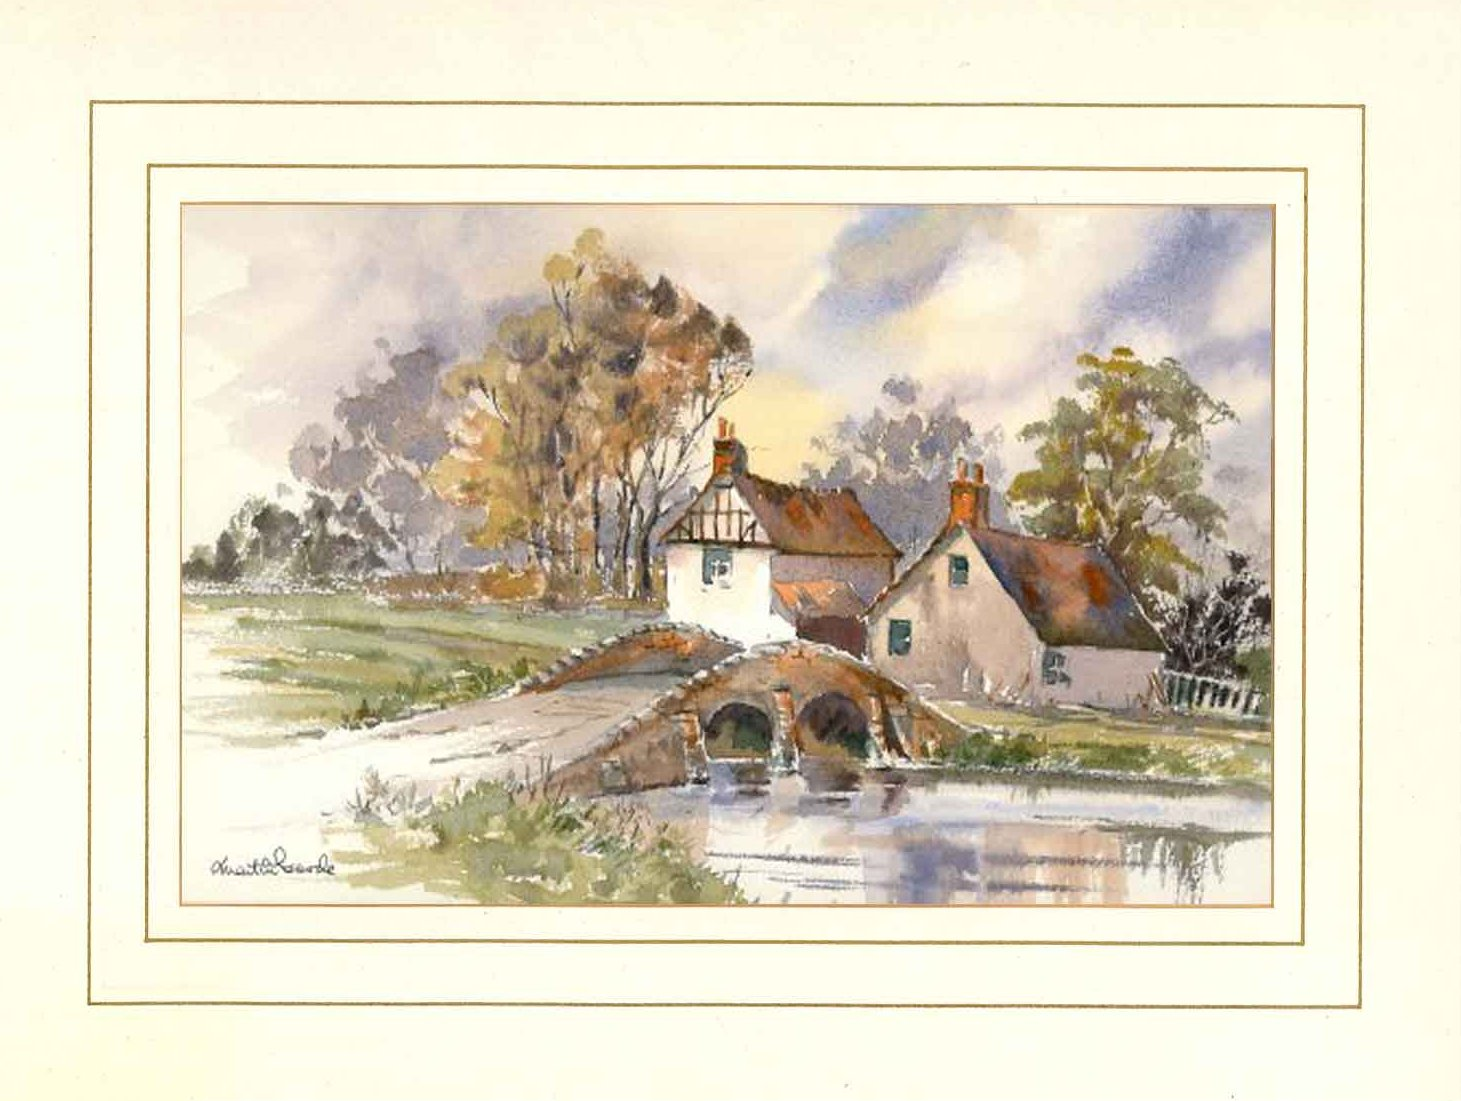 Packhorse Bridge, Original Watercolour Painting by Martin Goode